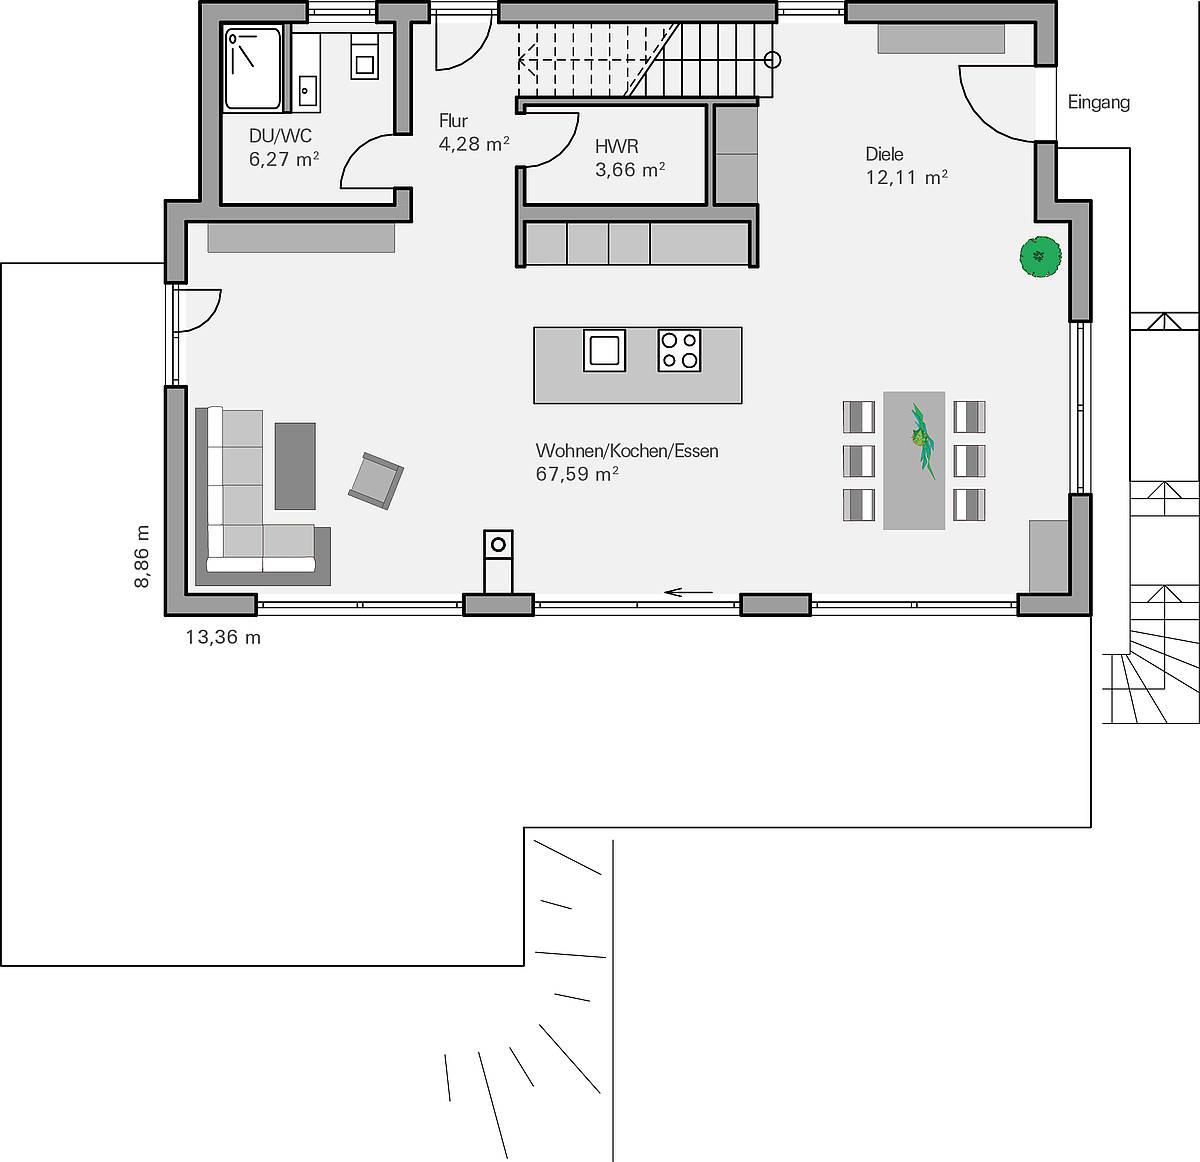 kundenhaus familie philipp zaunm ller massivhaus gmbh. Black Bedroom Furniture Sets. Home Design Ideas